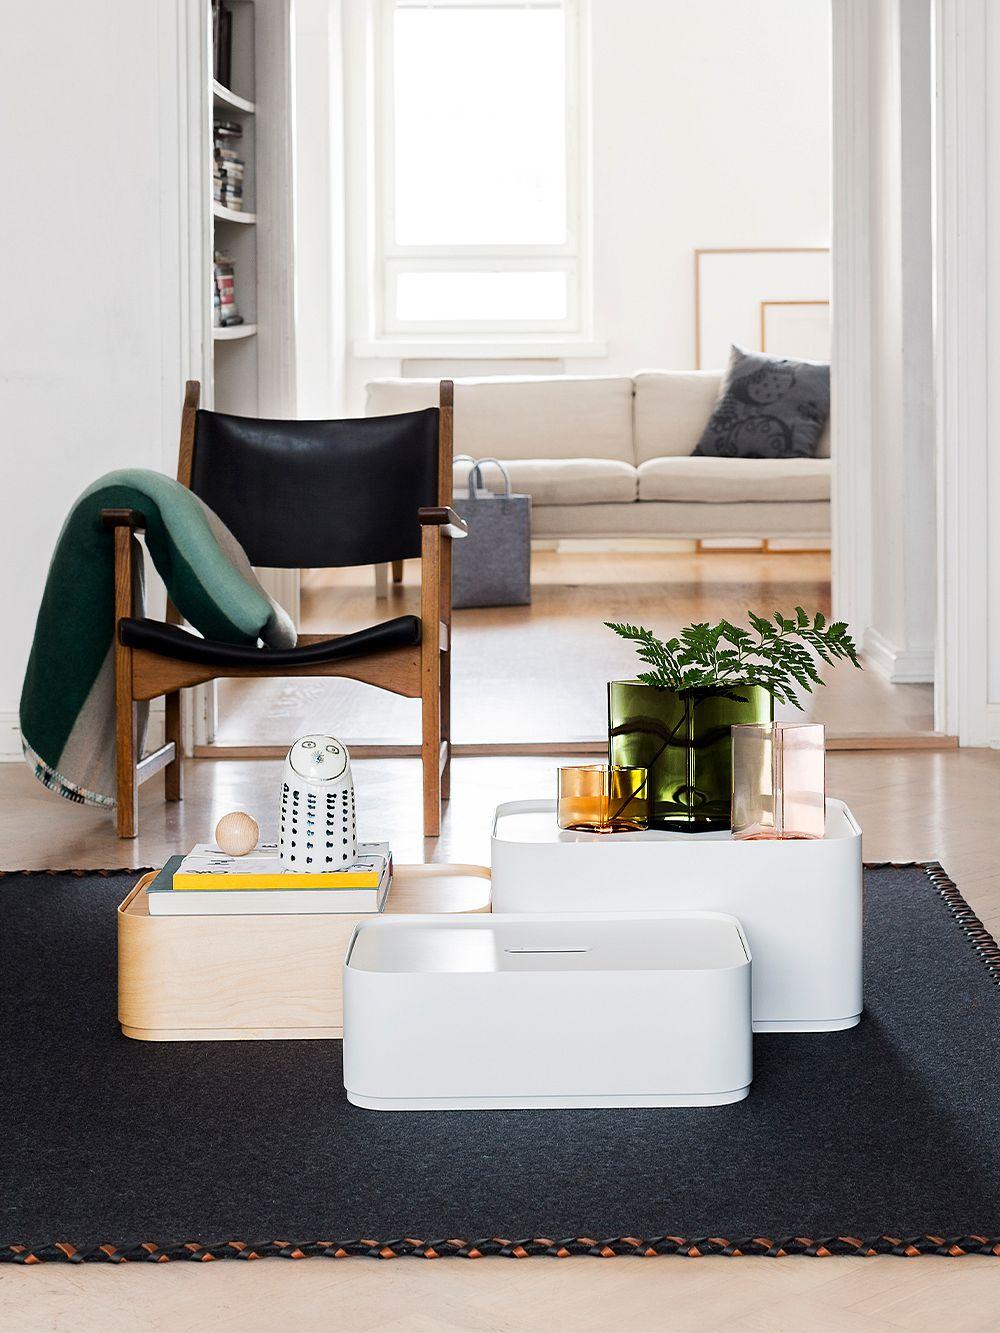 Iittalan Vakka box large, white